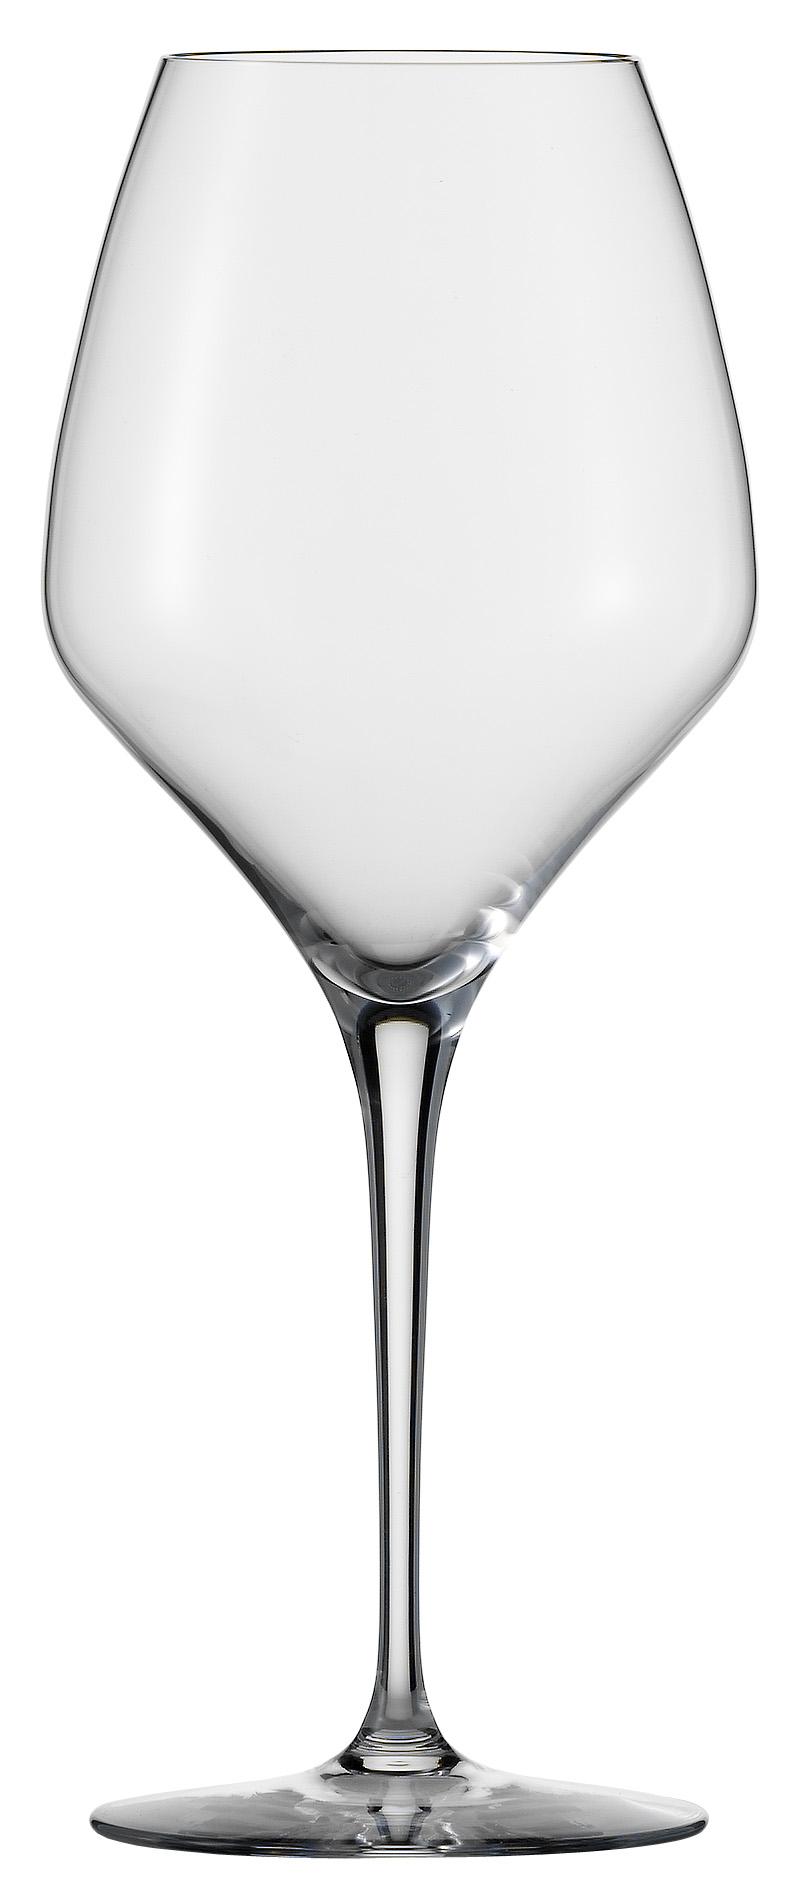 ZWIESEL 1872  THE FIRST 樽香を楽しむ白ワイン(シャルドネ)